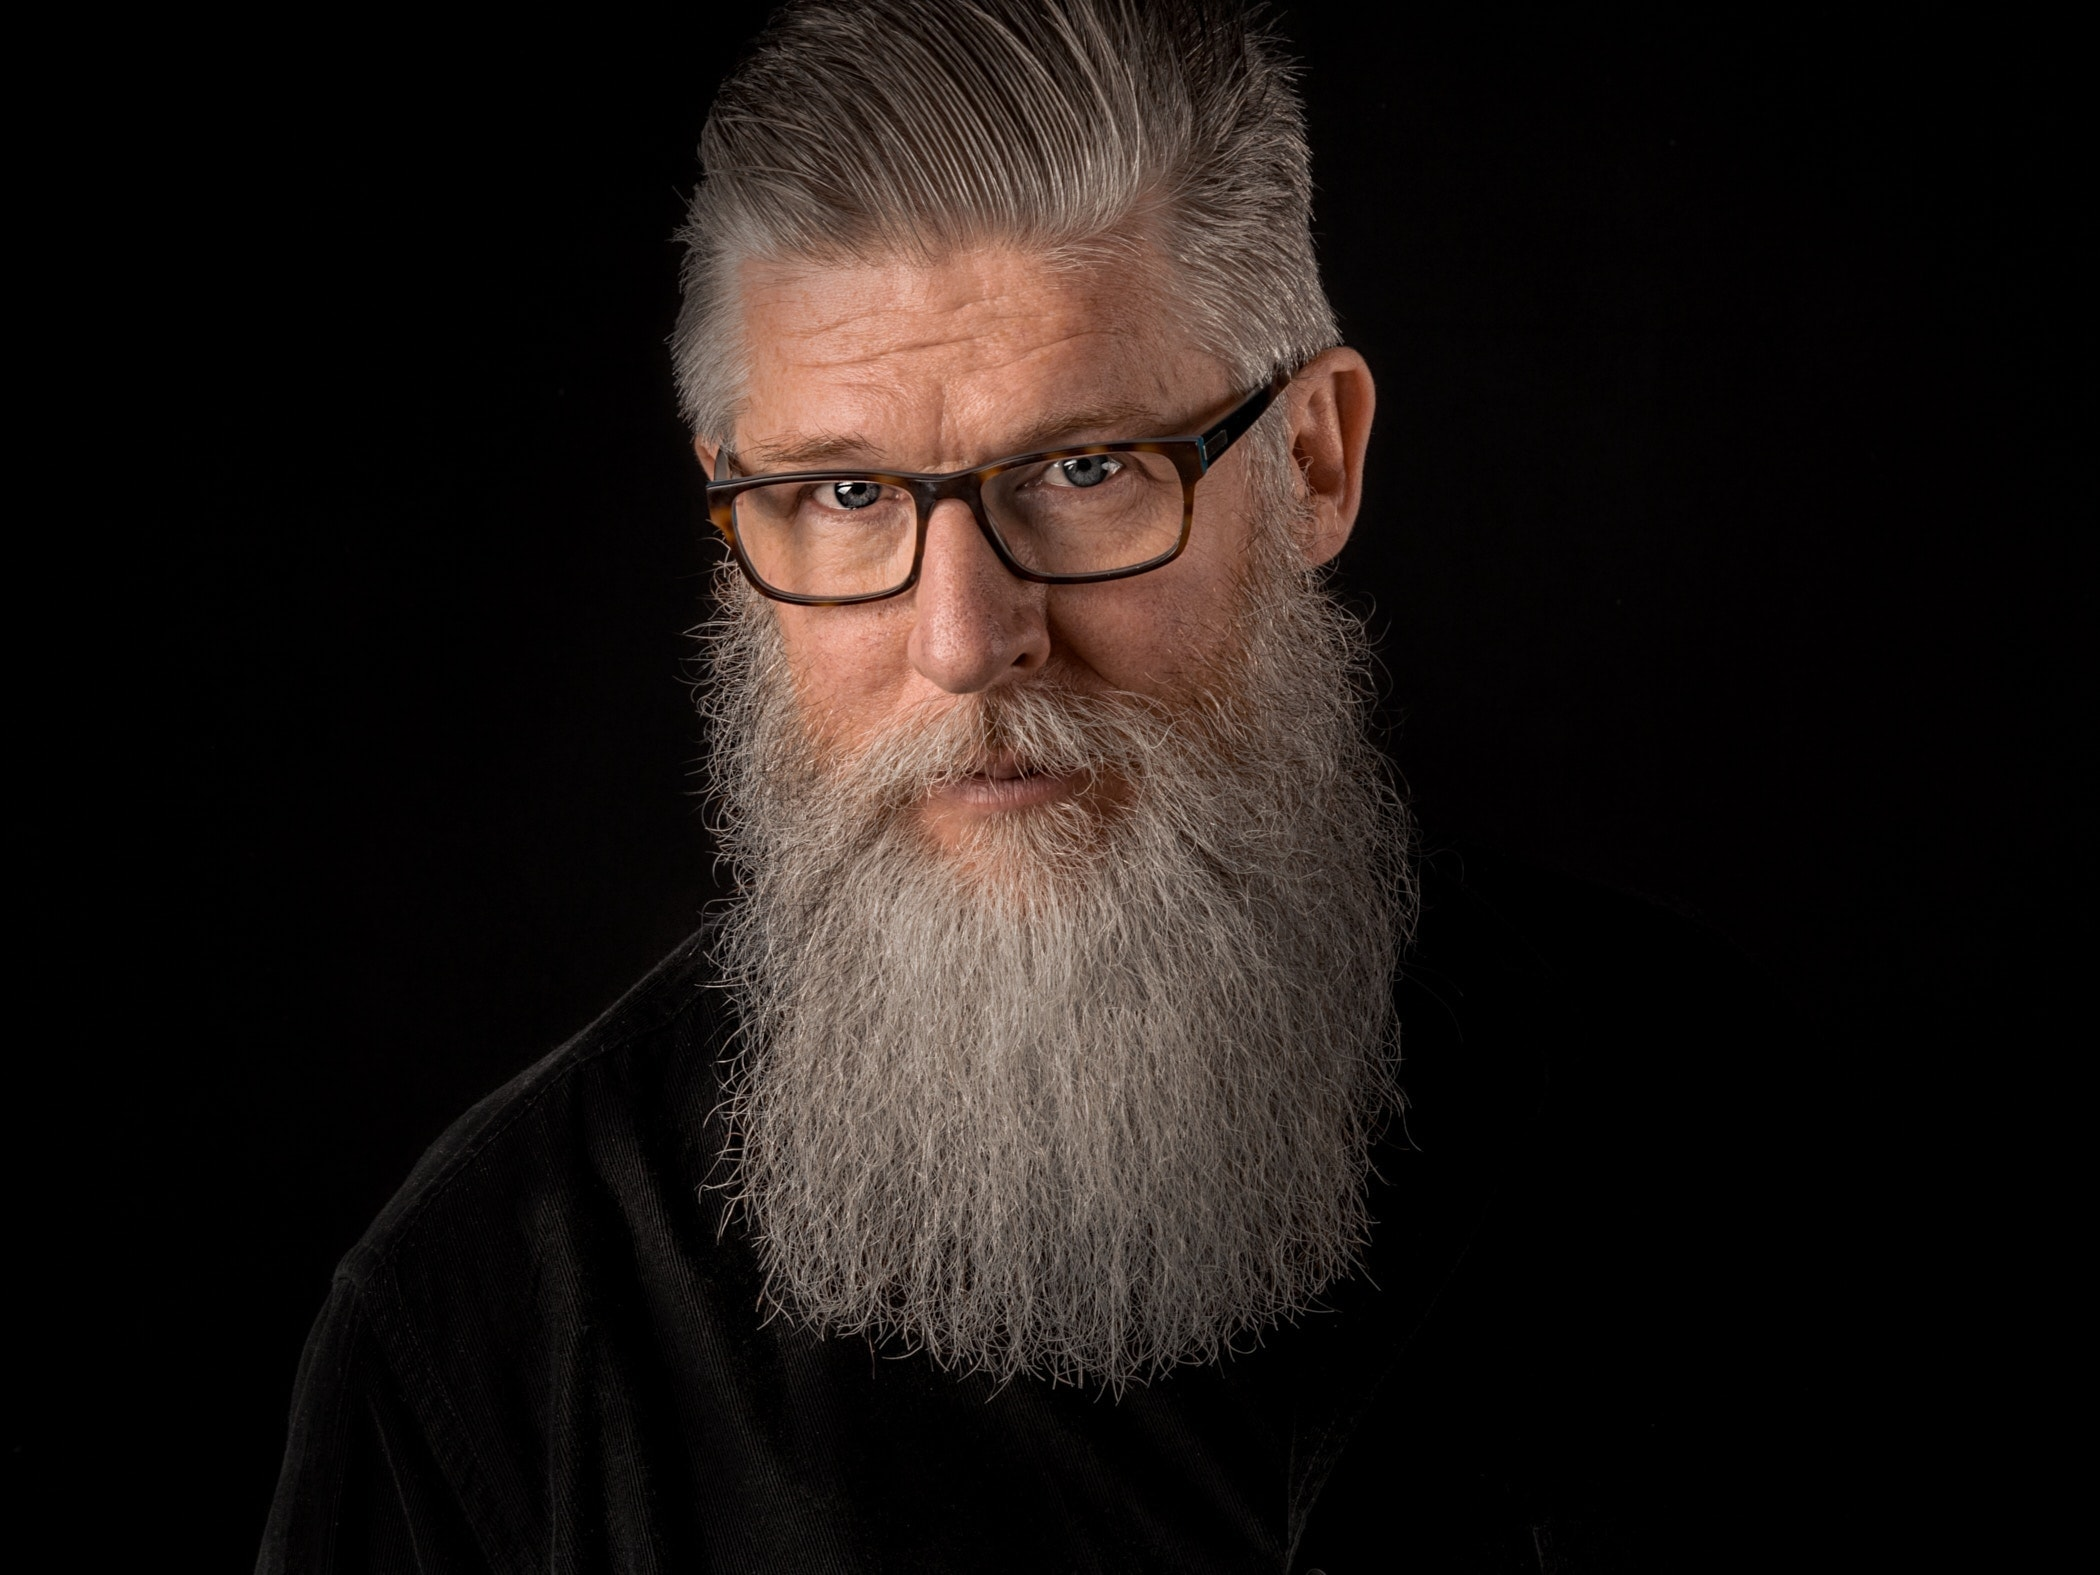 thick beard, growing a beard